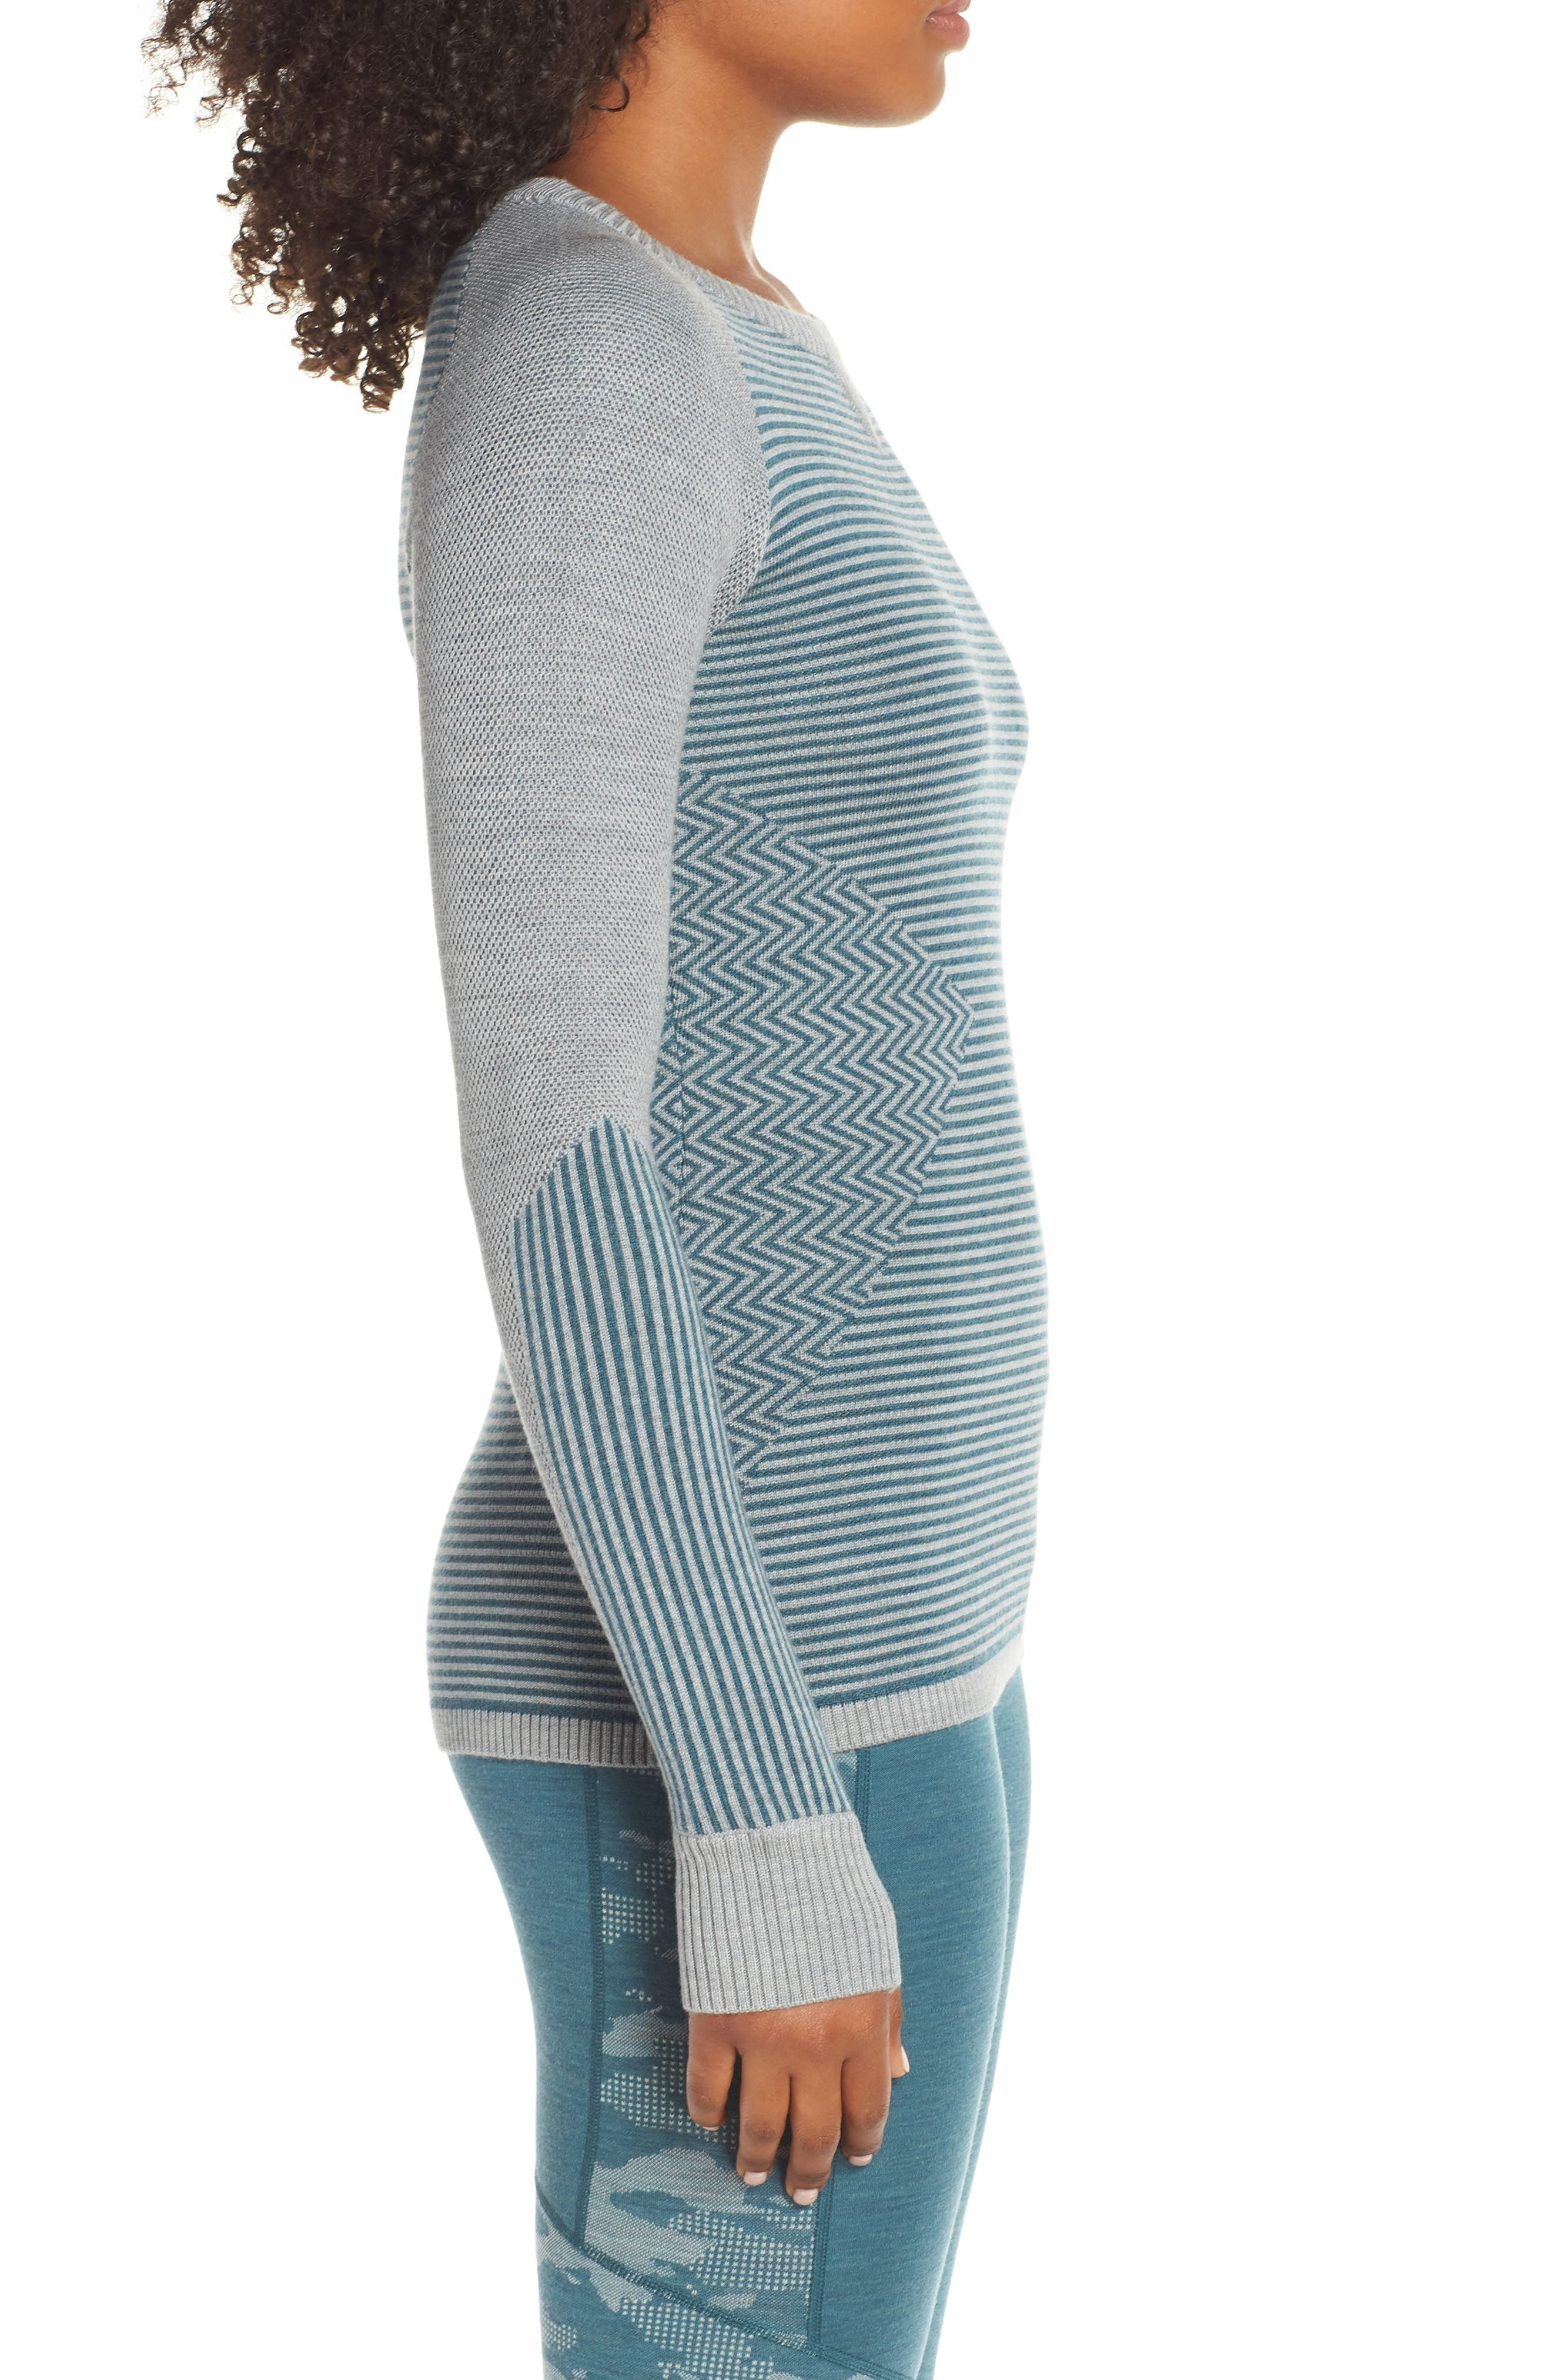 SMARTWOOL,                             Dacono Ski Sweater,                             Alternate thumbnail 3, color,                             310